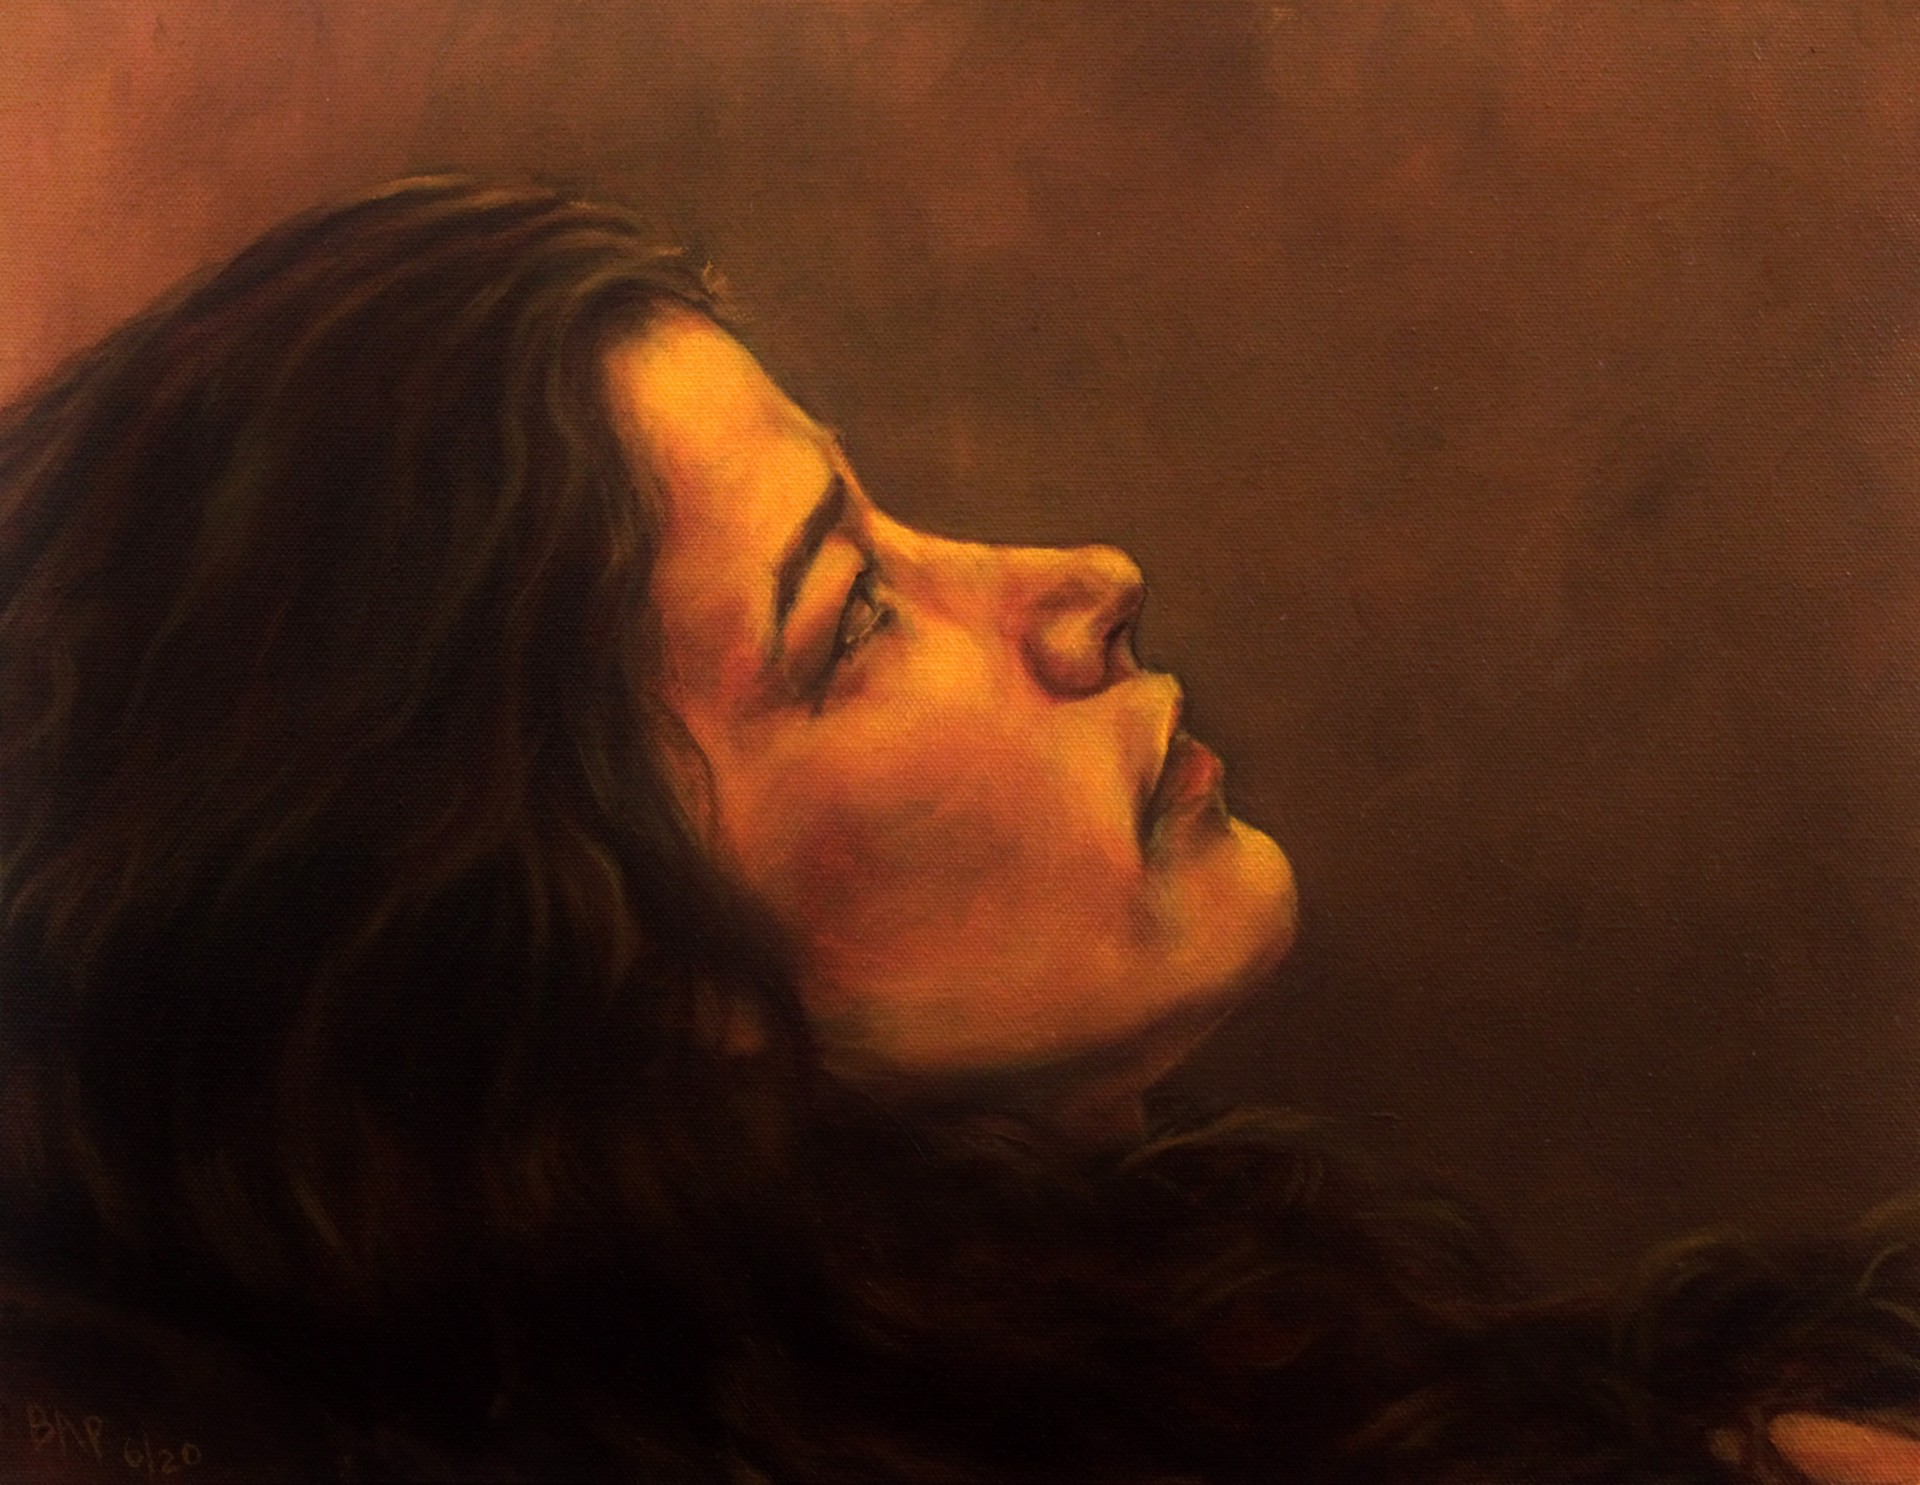 Lost by Benji Alexander Palus